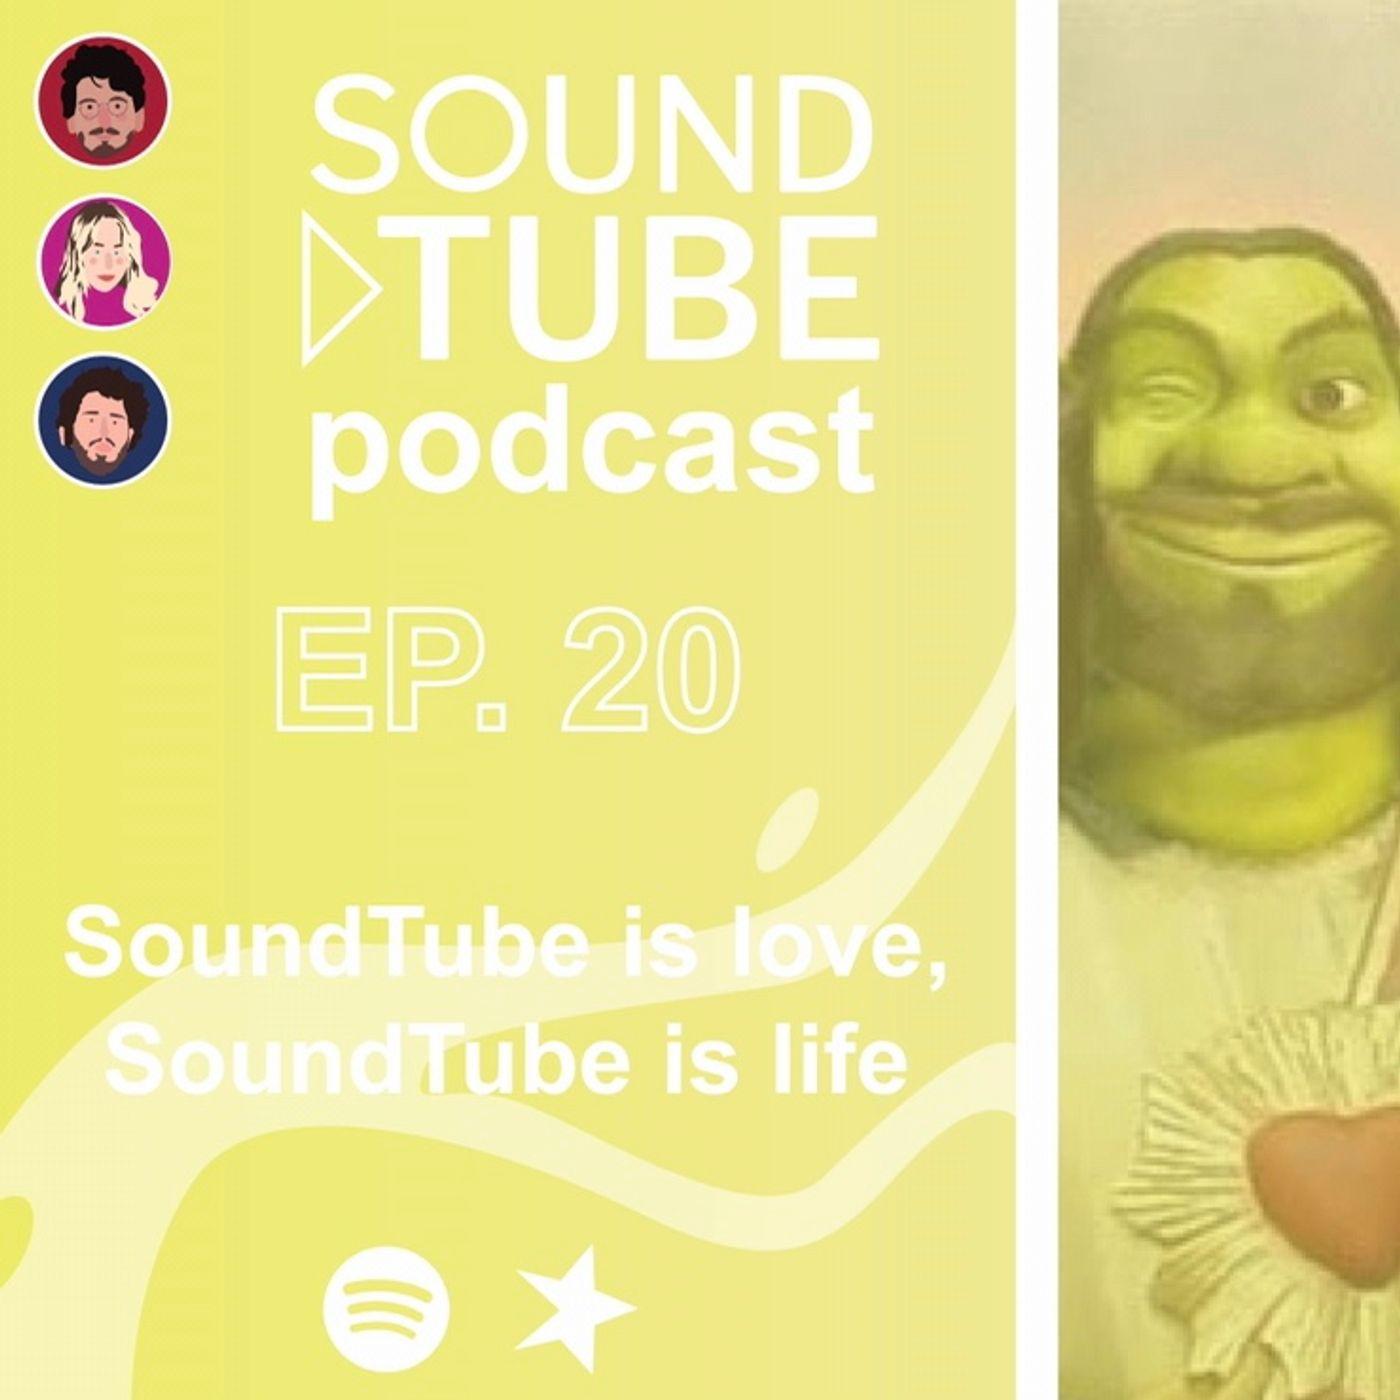 SoundTube is love, SoundTube is life - ep 20 domenica 26/7